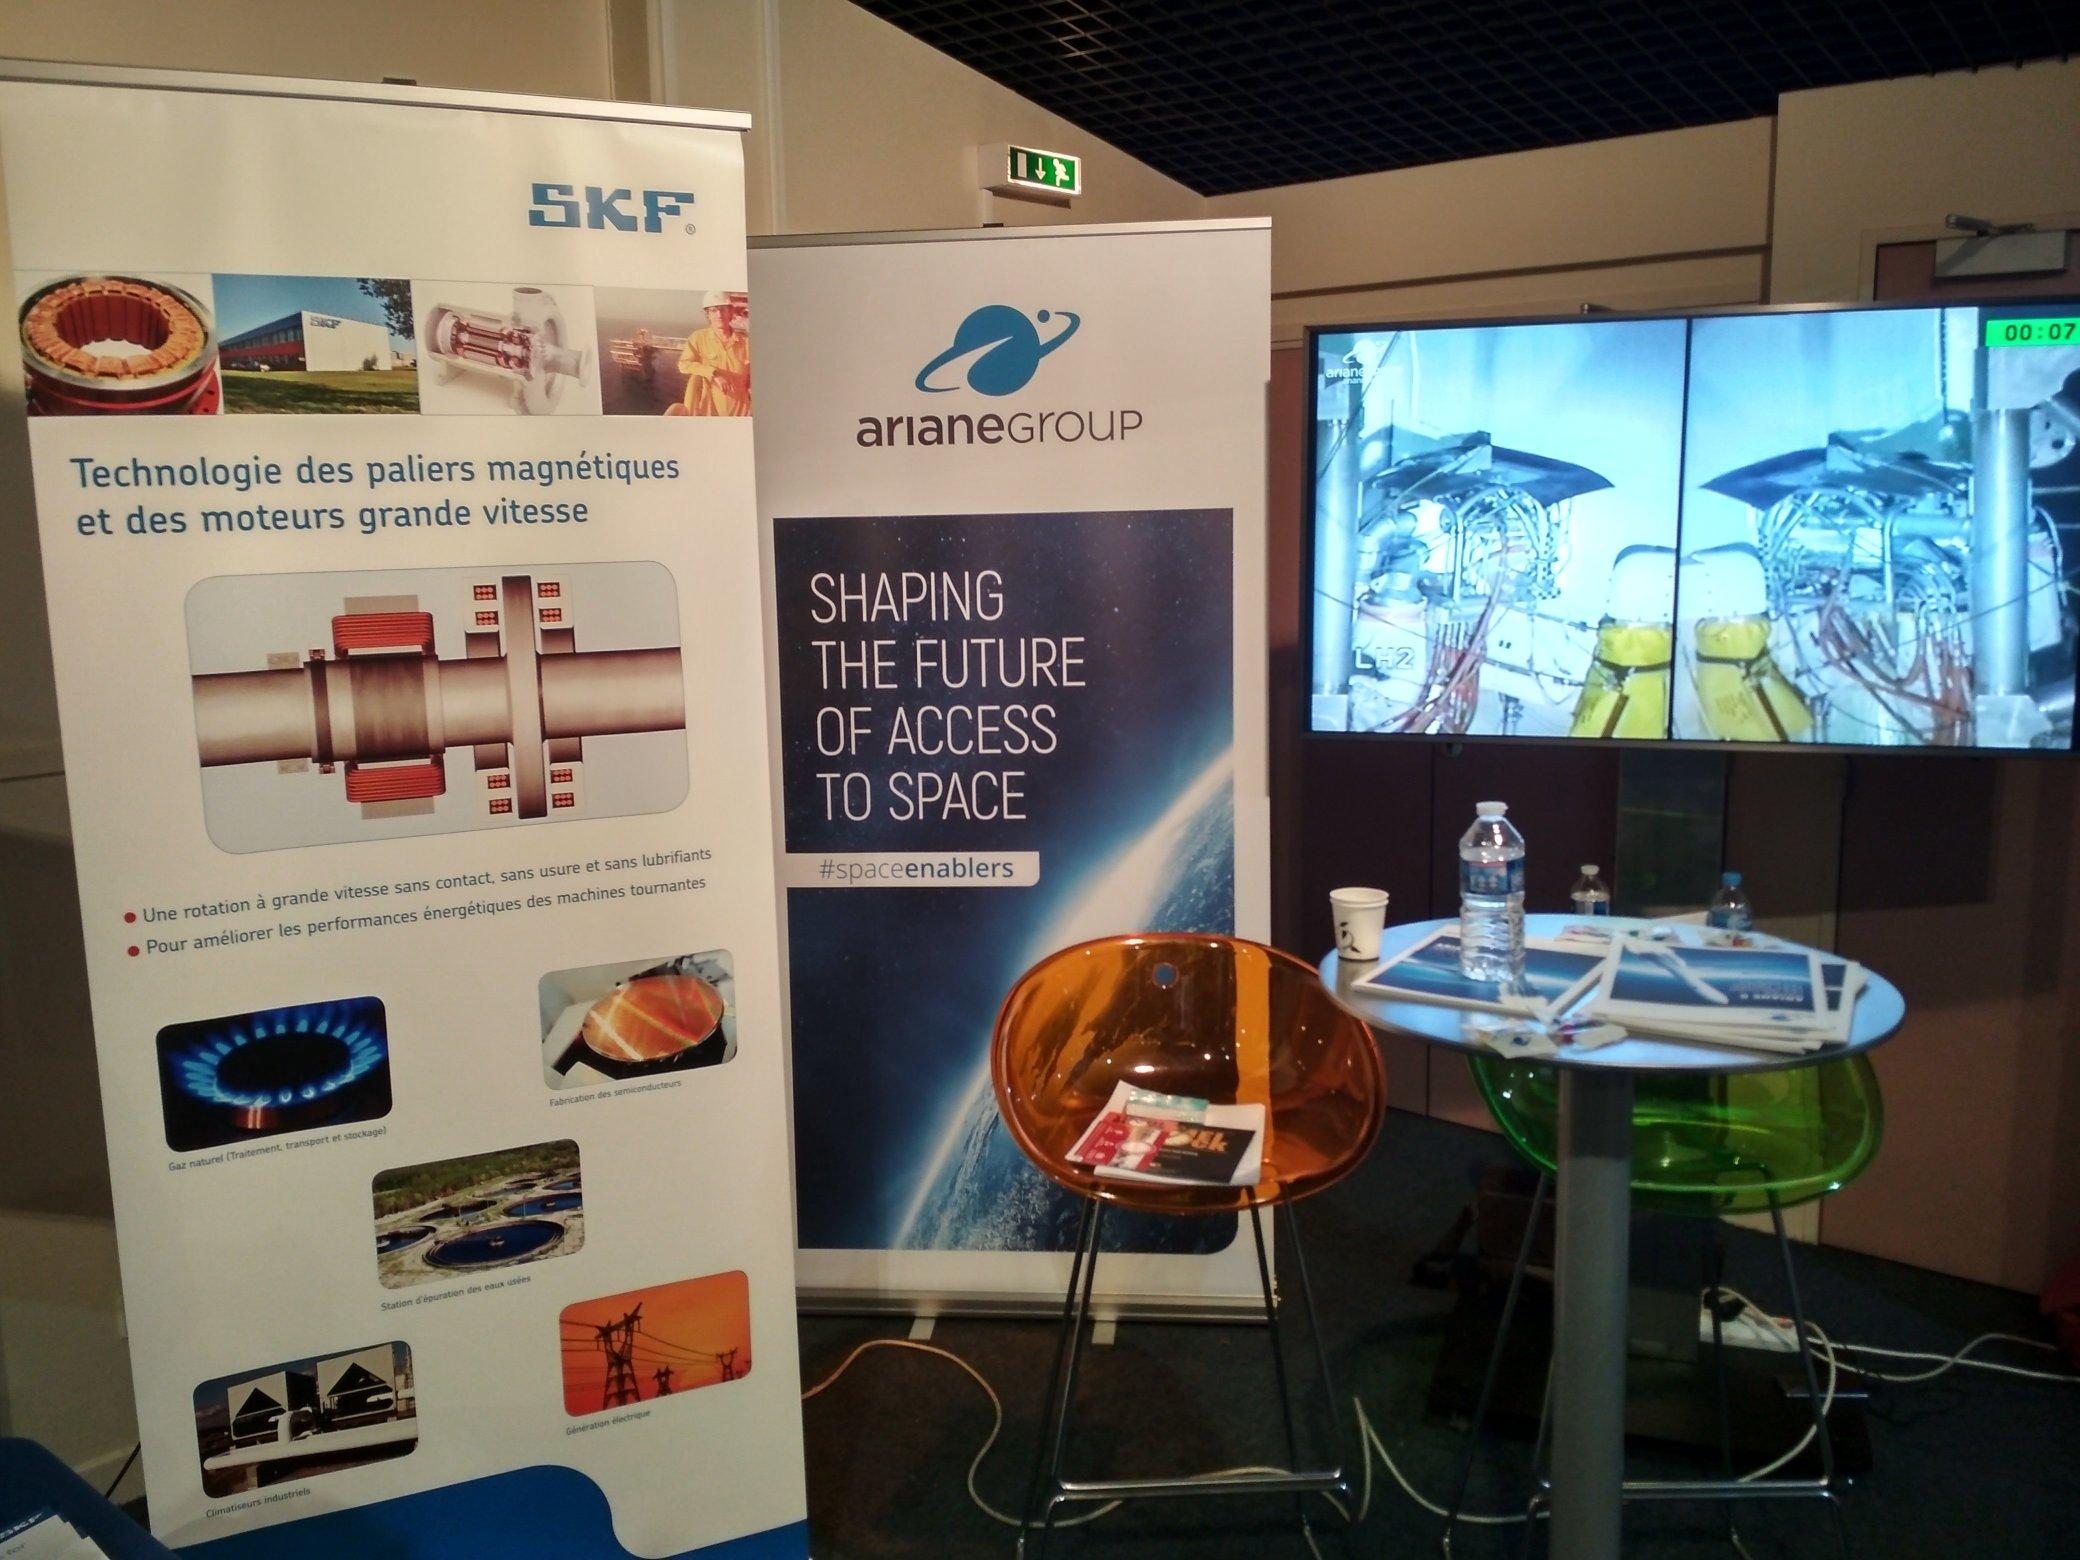 ArianeGroup et SKF